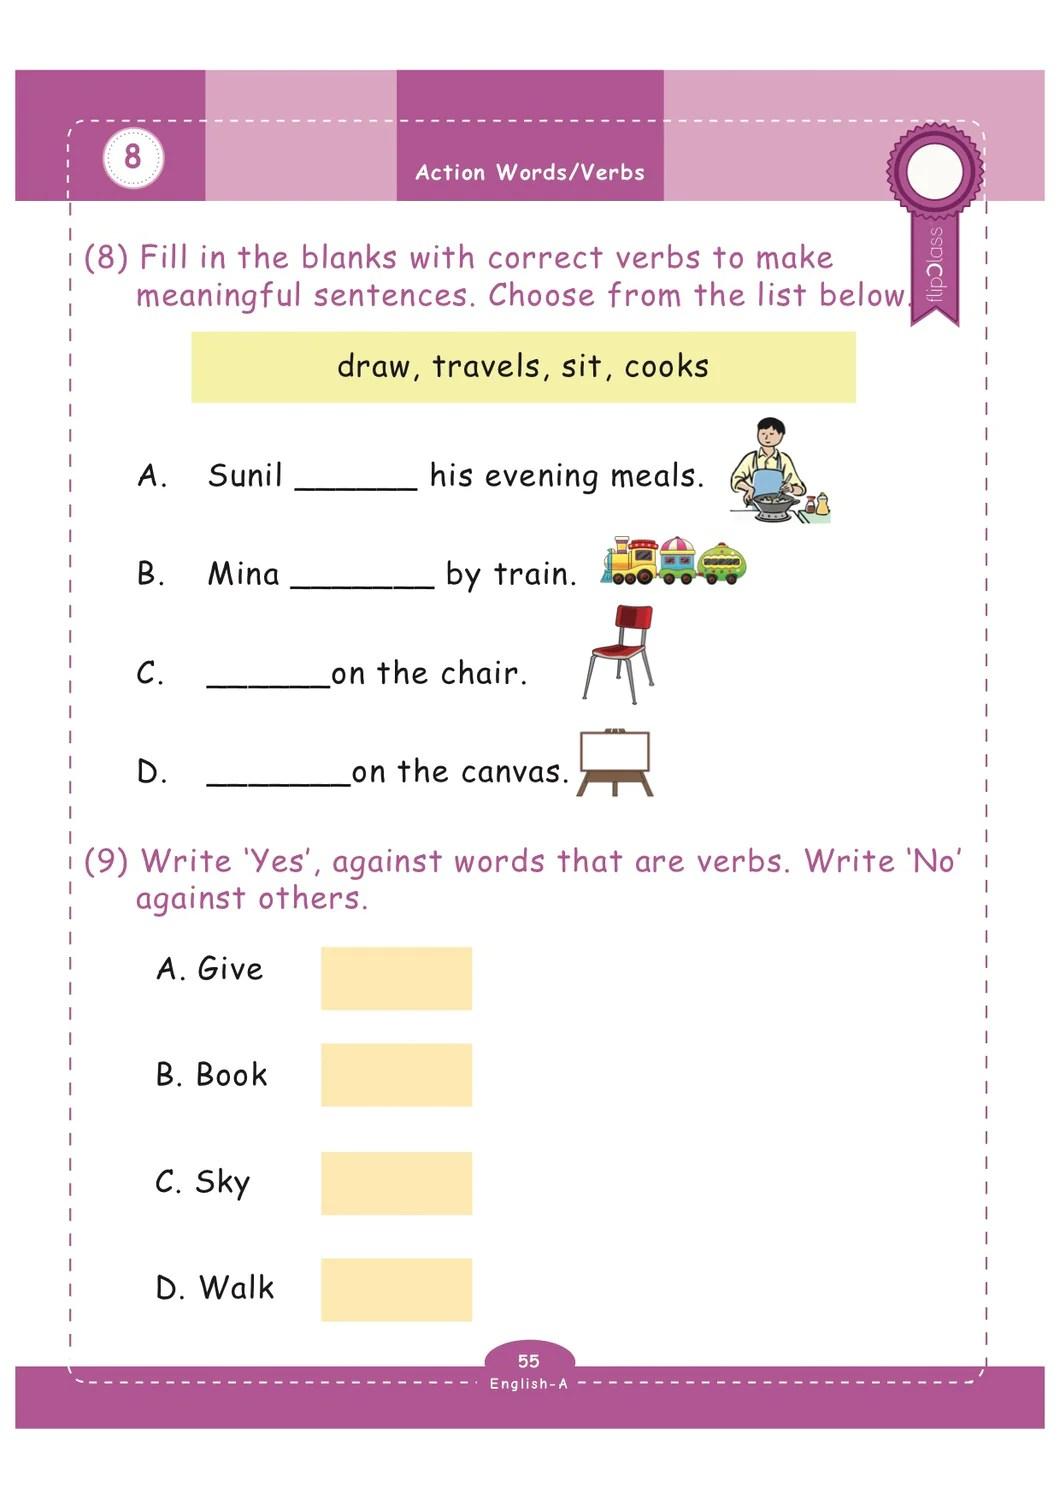 hight resolution of https://dubaikhalifas.com/english-worksheet-for-class1-grade-1-english-worksheet-kids-learning-fun/